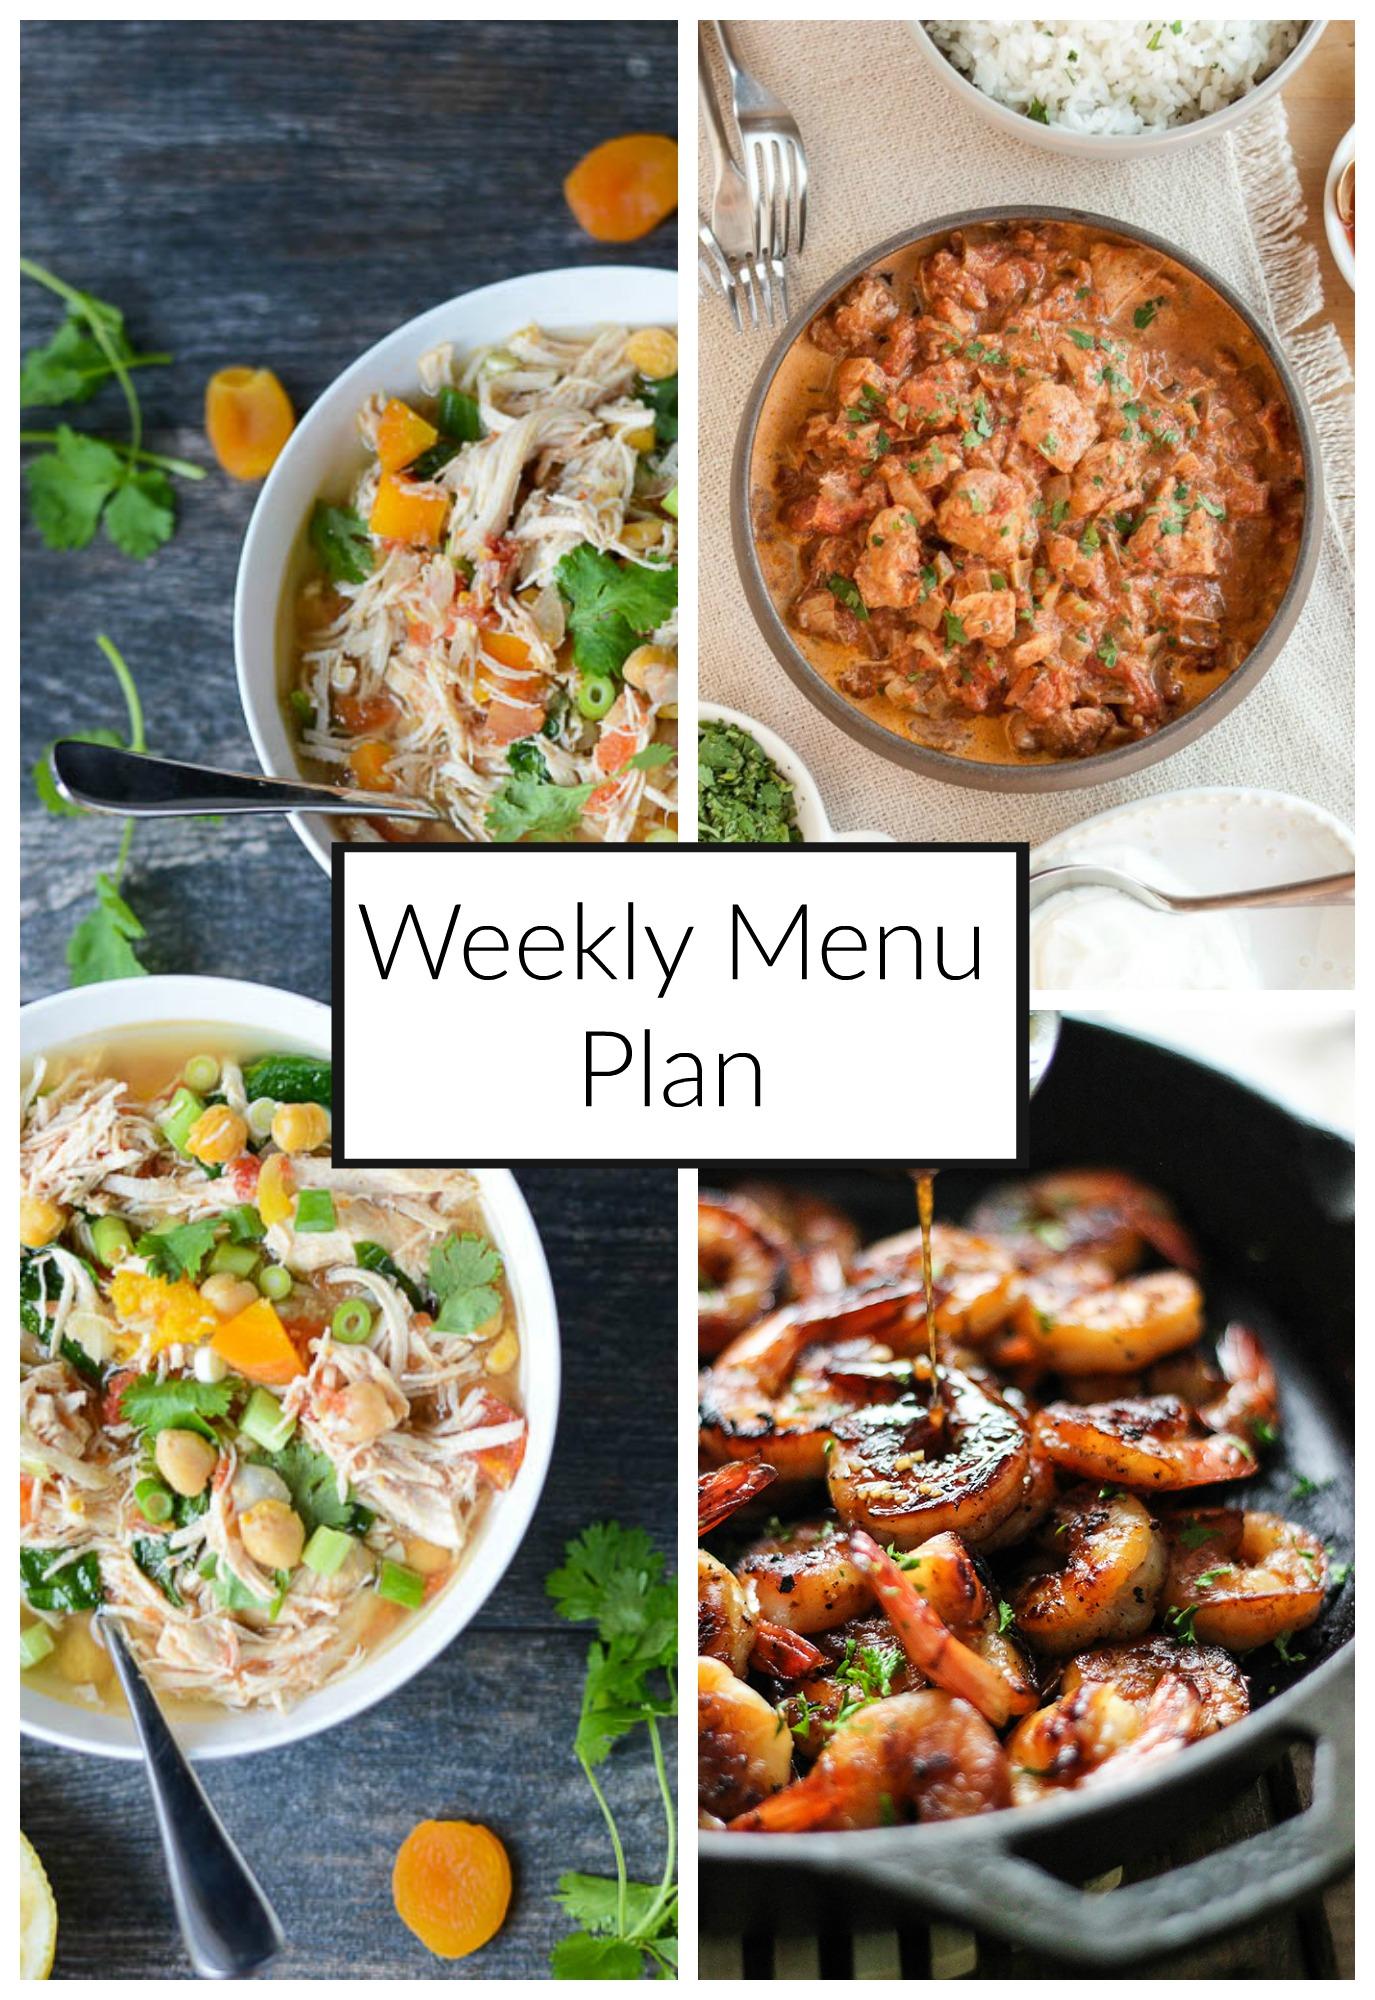 Easy weeknight dinner recipe ideas